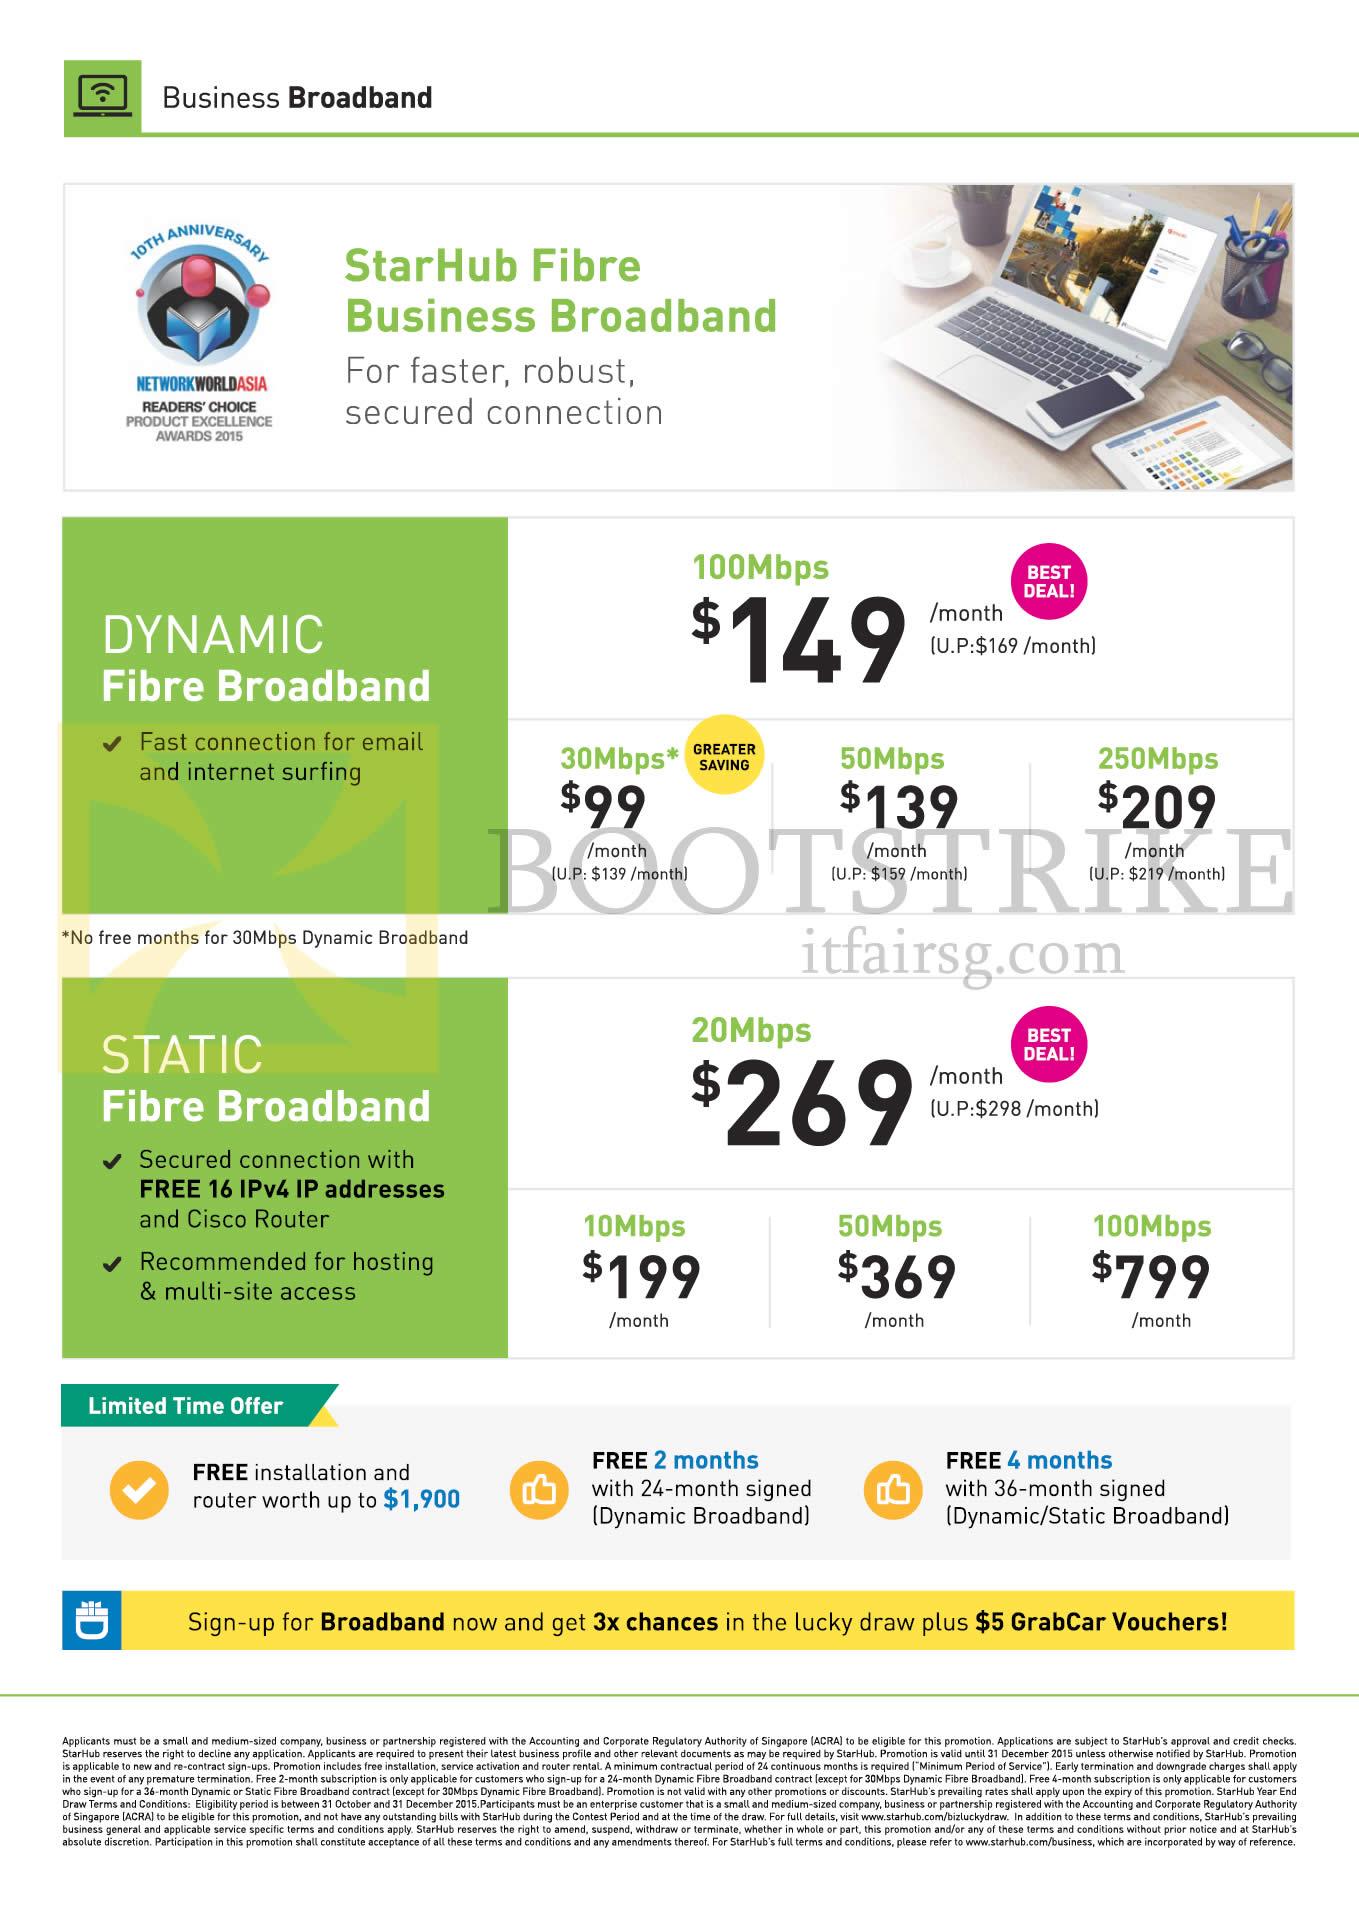 SITEX 2015 price list image brochure of Starhub Business Dynamic, Static Fibre Broadband 10Mbps, 20Mbps, 30Mbps, 50Mbps, 100Mbps, 250Mbps